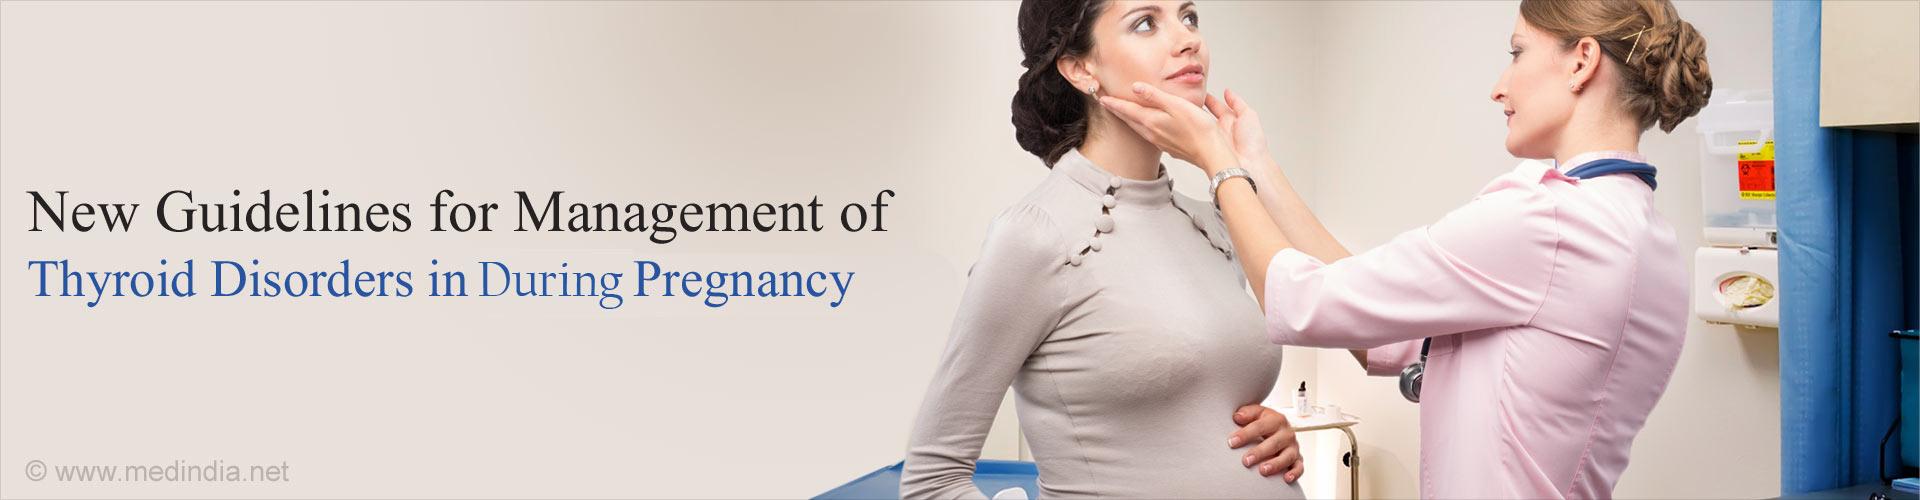 New International Guidelines For Thyroid Disease in Pregnancy